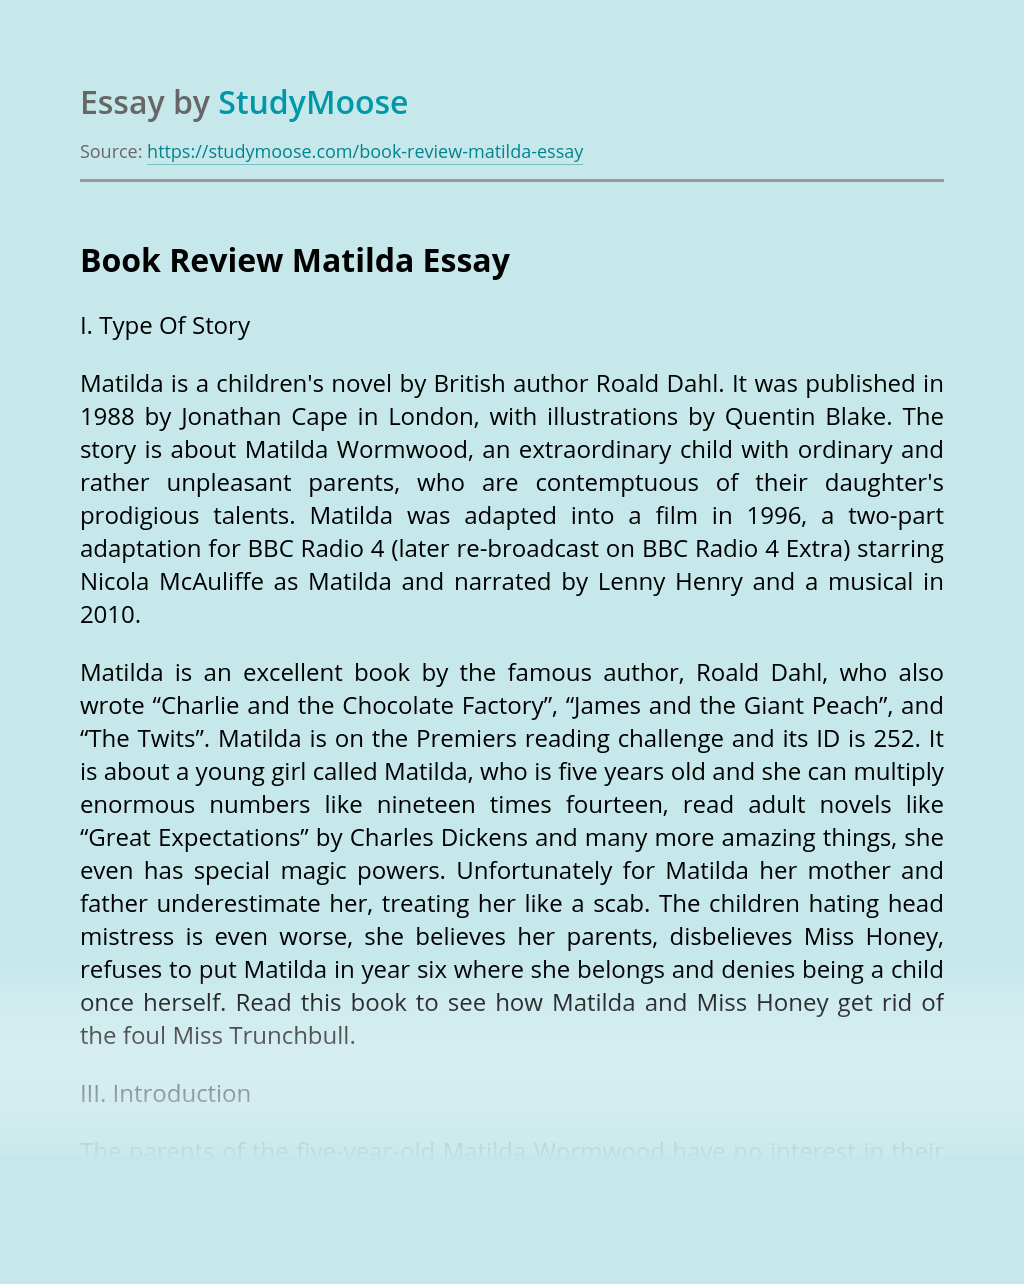 Book Review Matilda